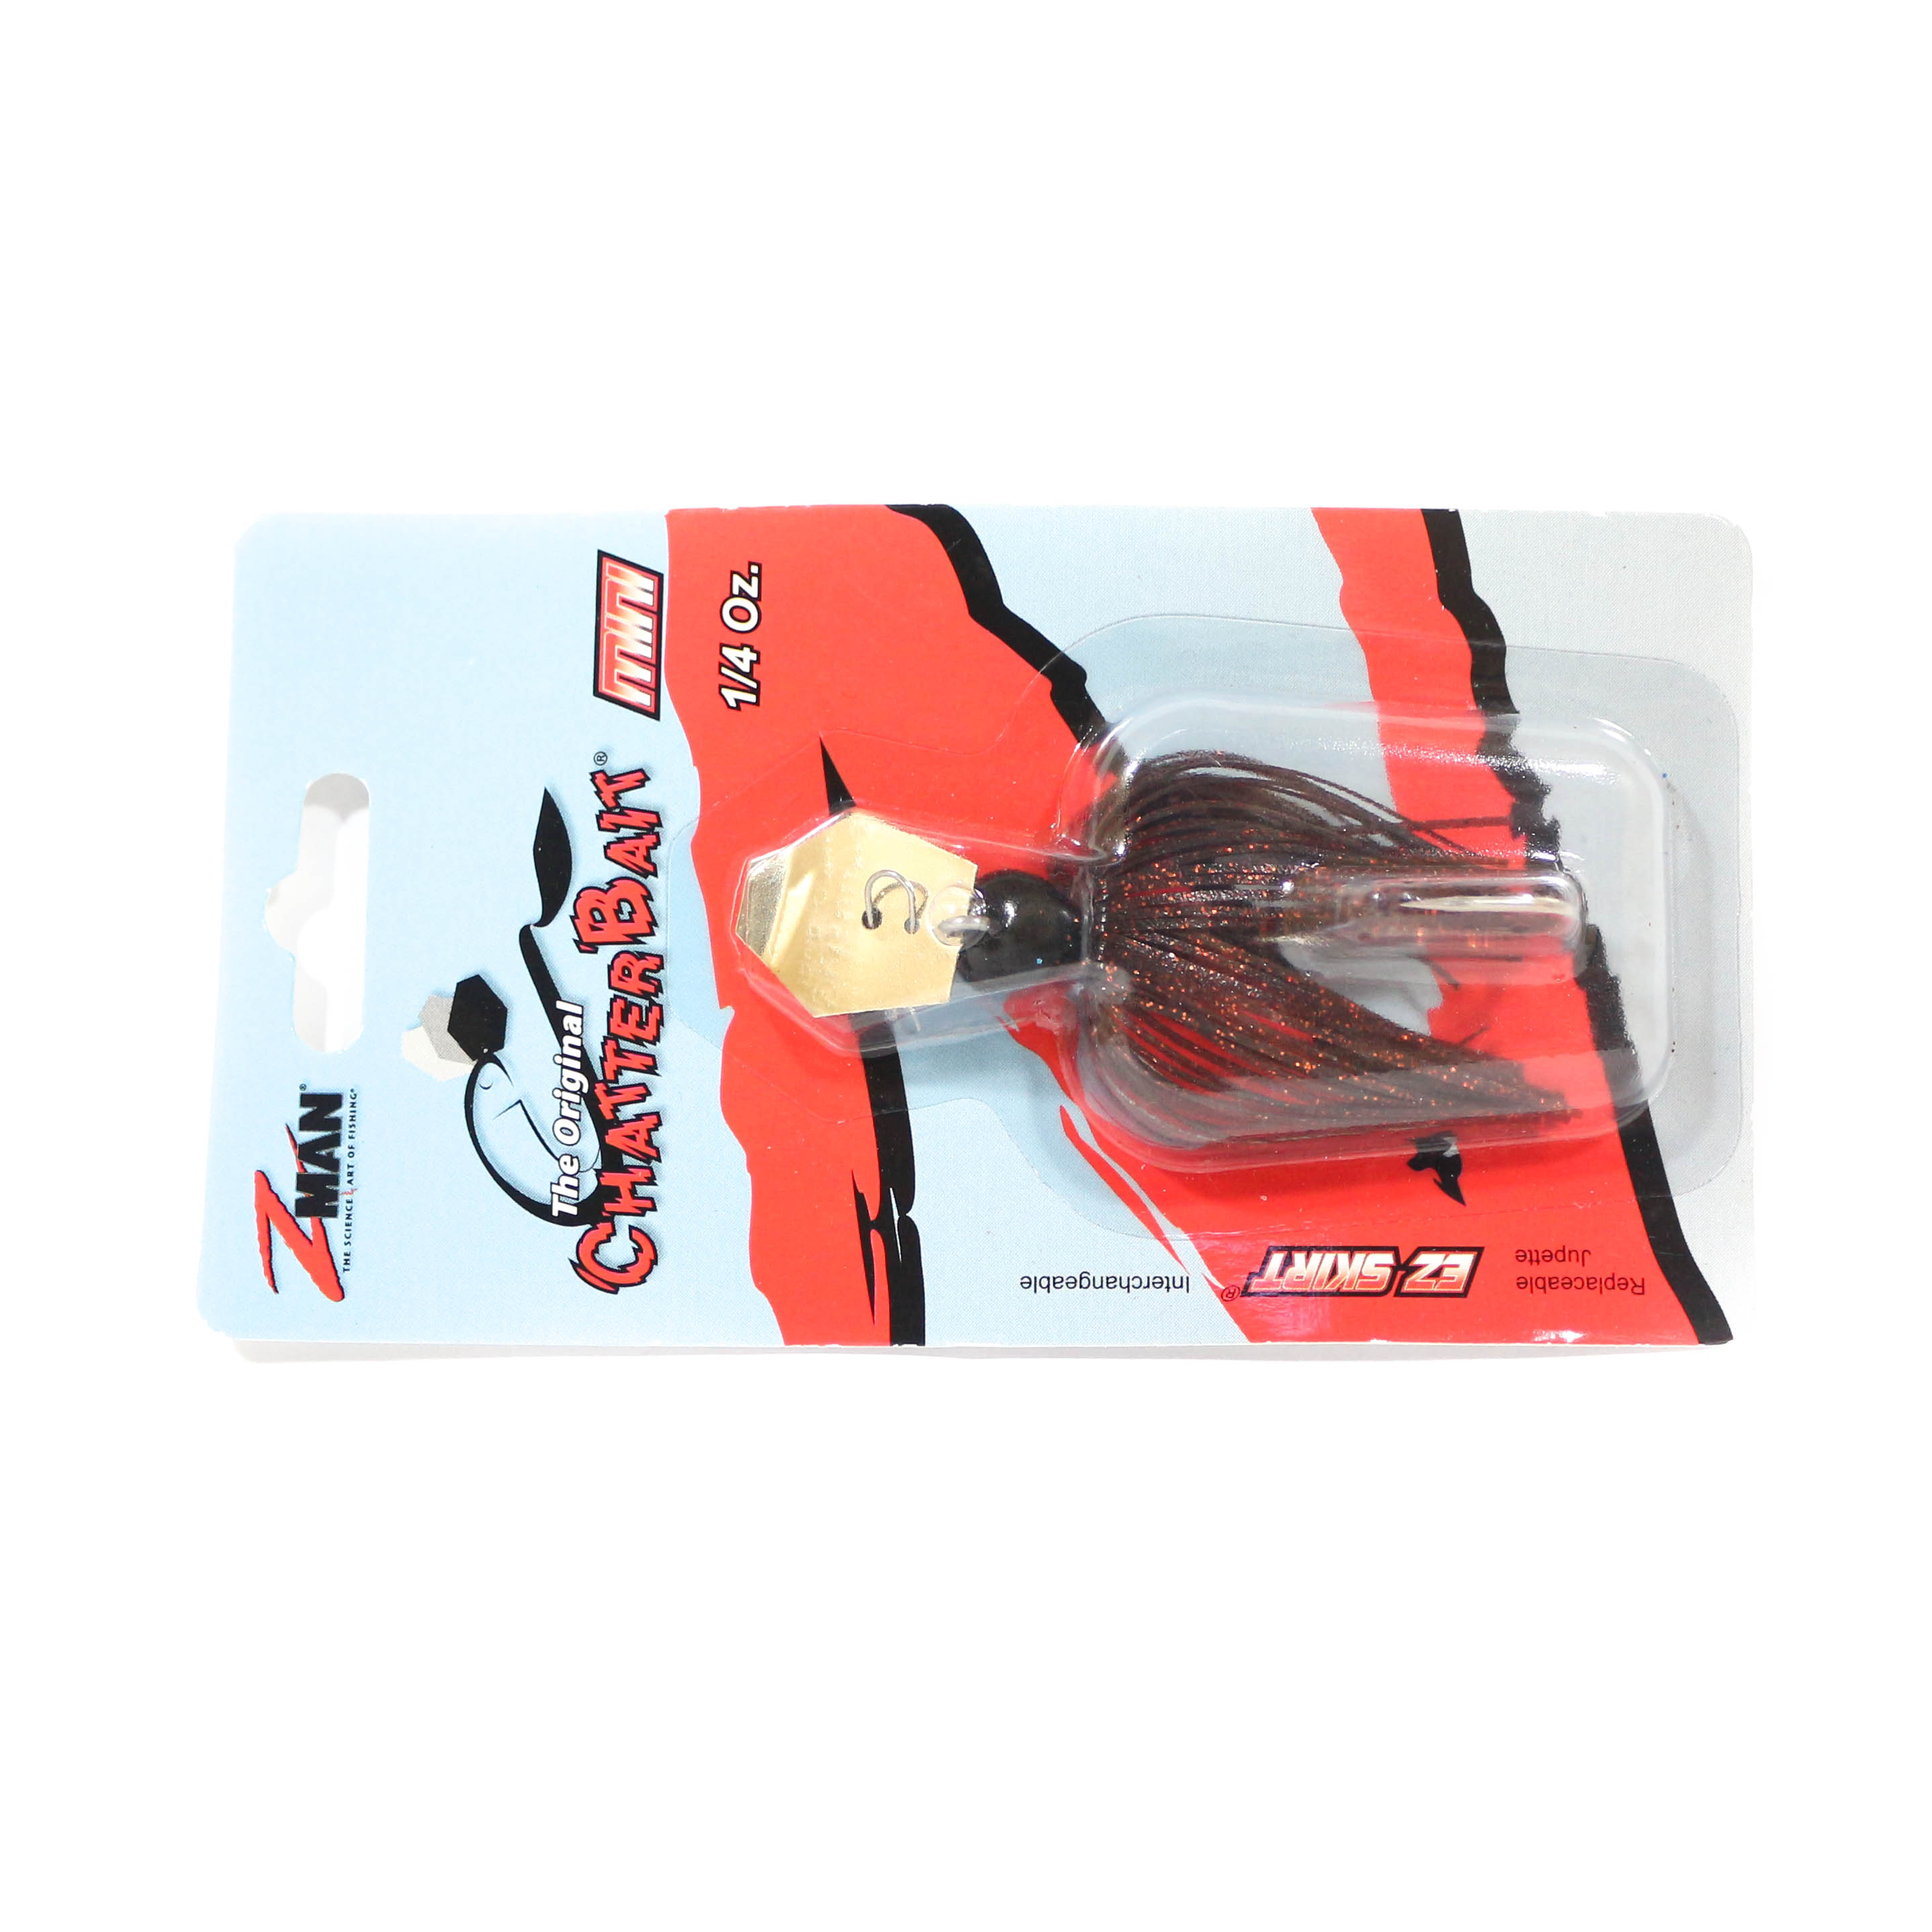 Zman Chatterbait Mini 1/4 oz Sinking Lure Brown Black (0259)